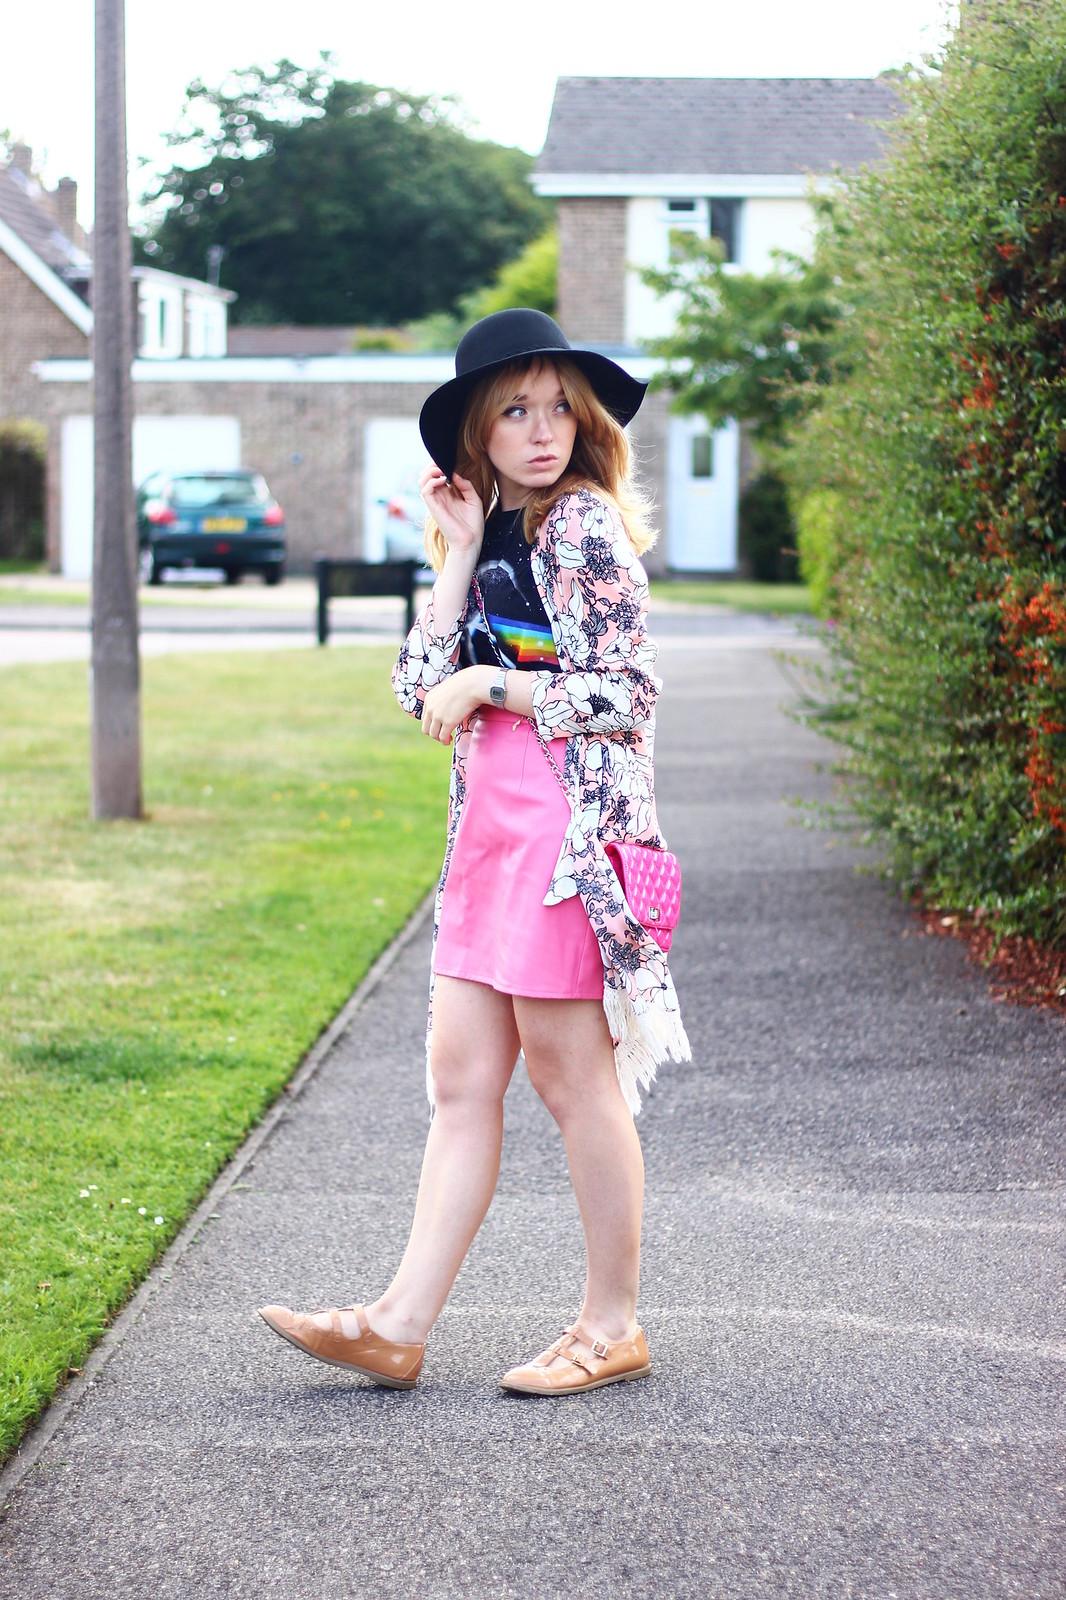 2pinkfloydtee, band tee pink skirt outfit, style, boho